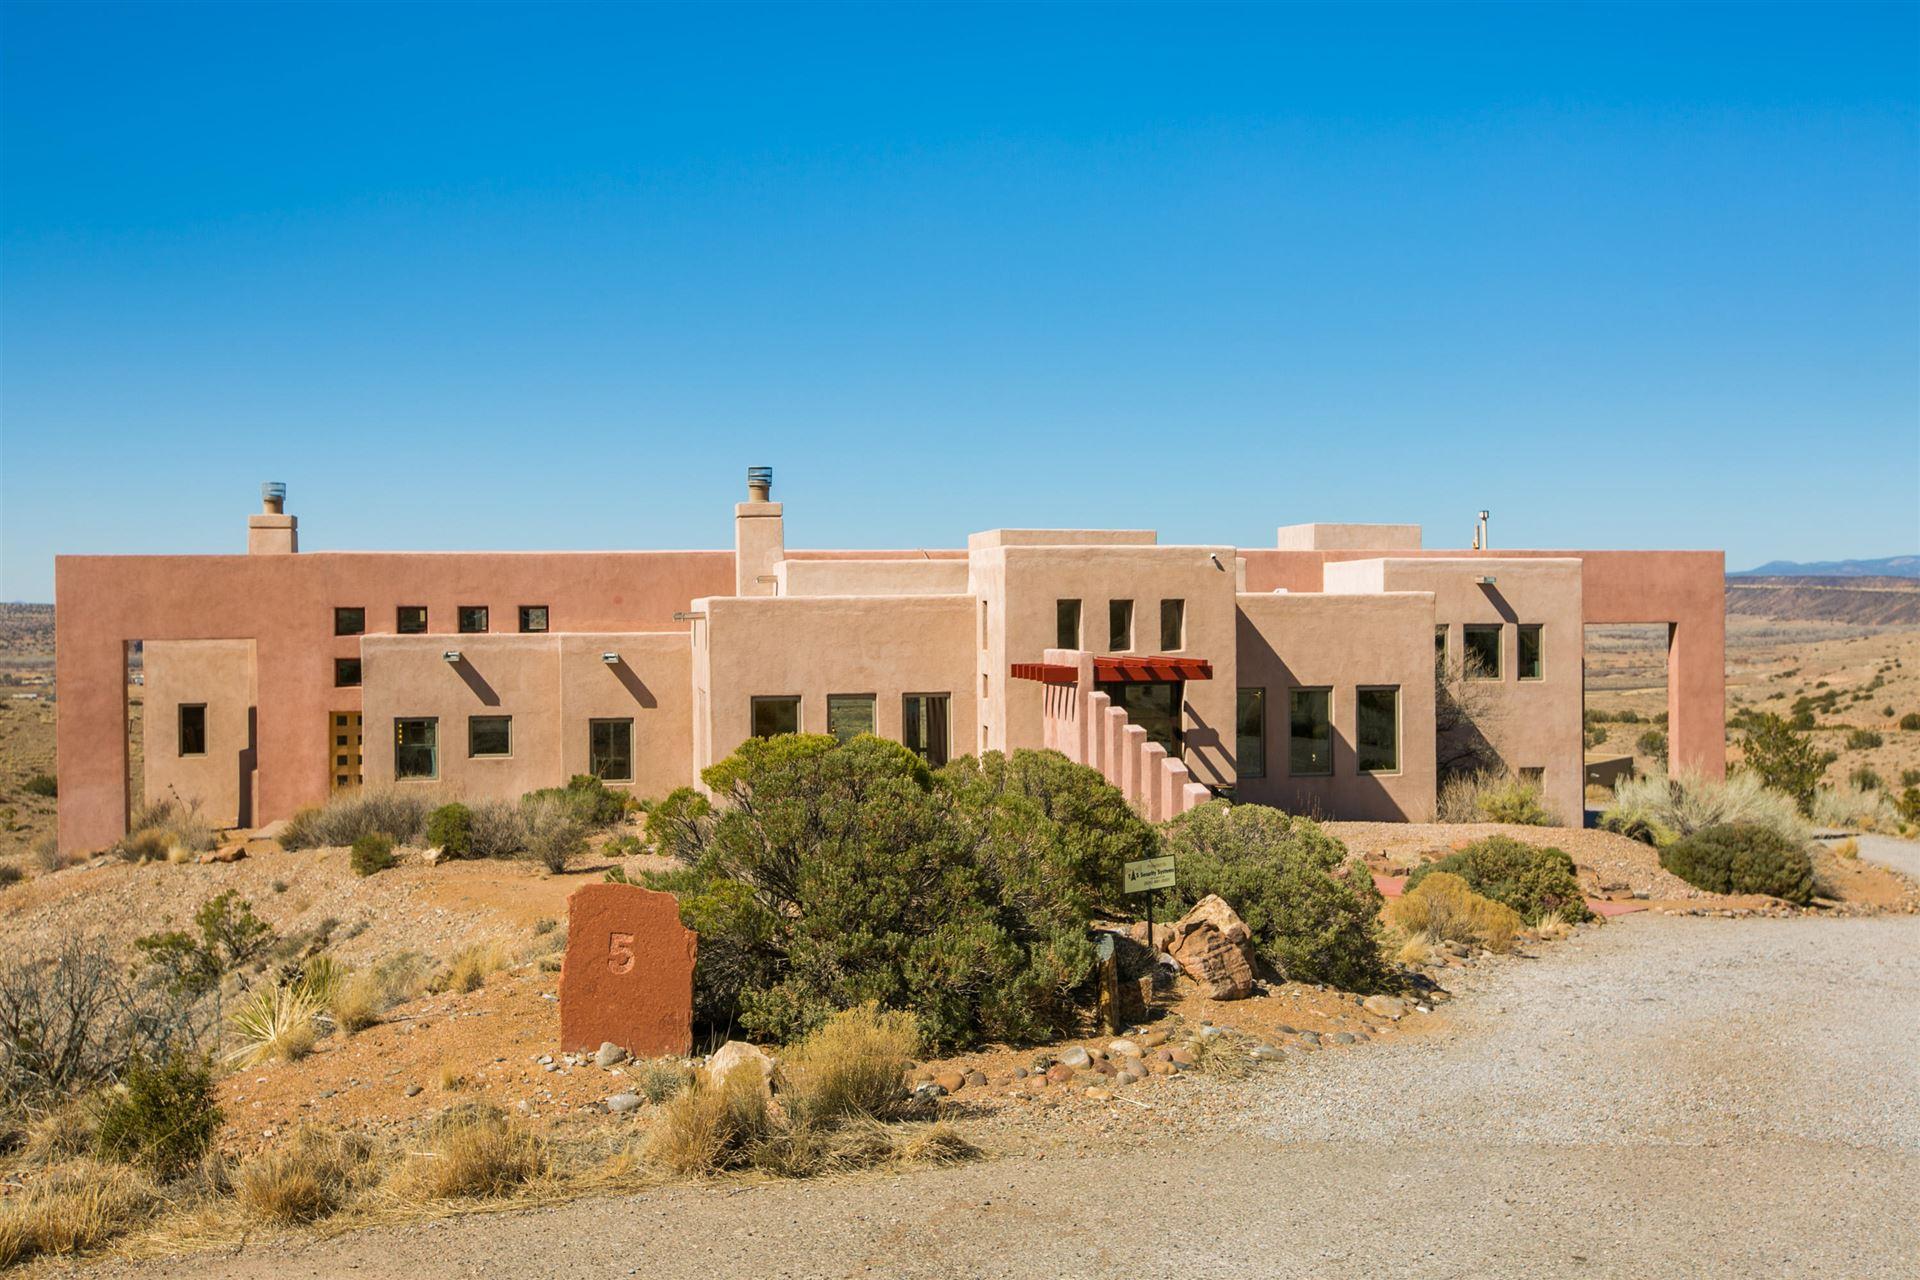 Photo of 5 SUNSET MESA Court, Placitas, NM 87043 (MLS # 986970)